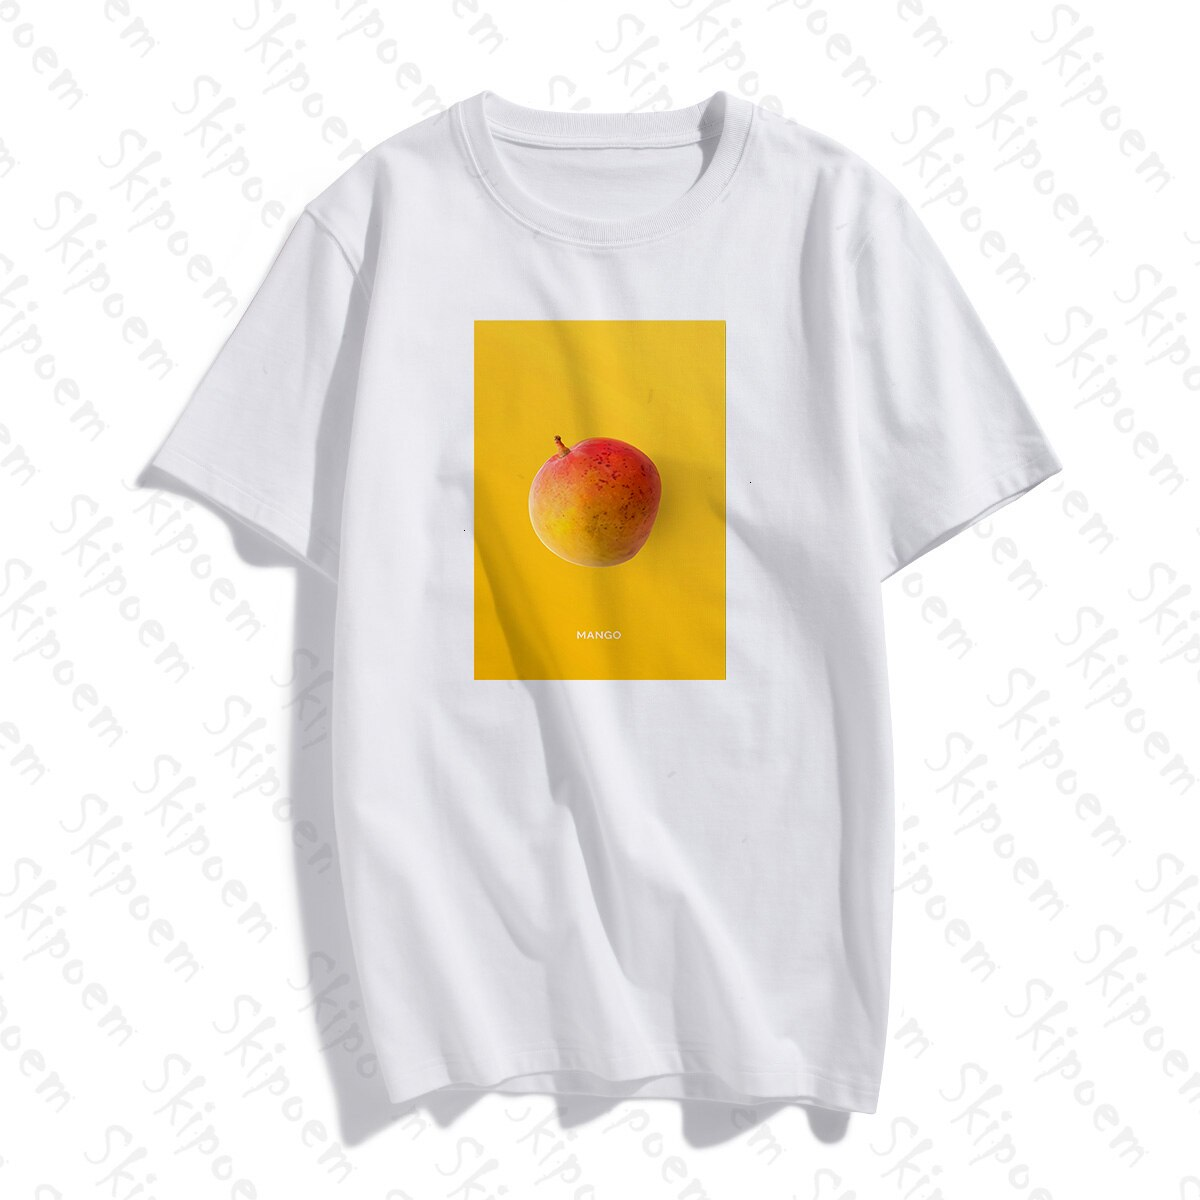 Fruta arte Mango camiseta mujer Vintage estilo coreano estético Kawaii Punk Tumblr algodón de talla grande ropa de manga corta ropa de calle